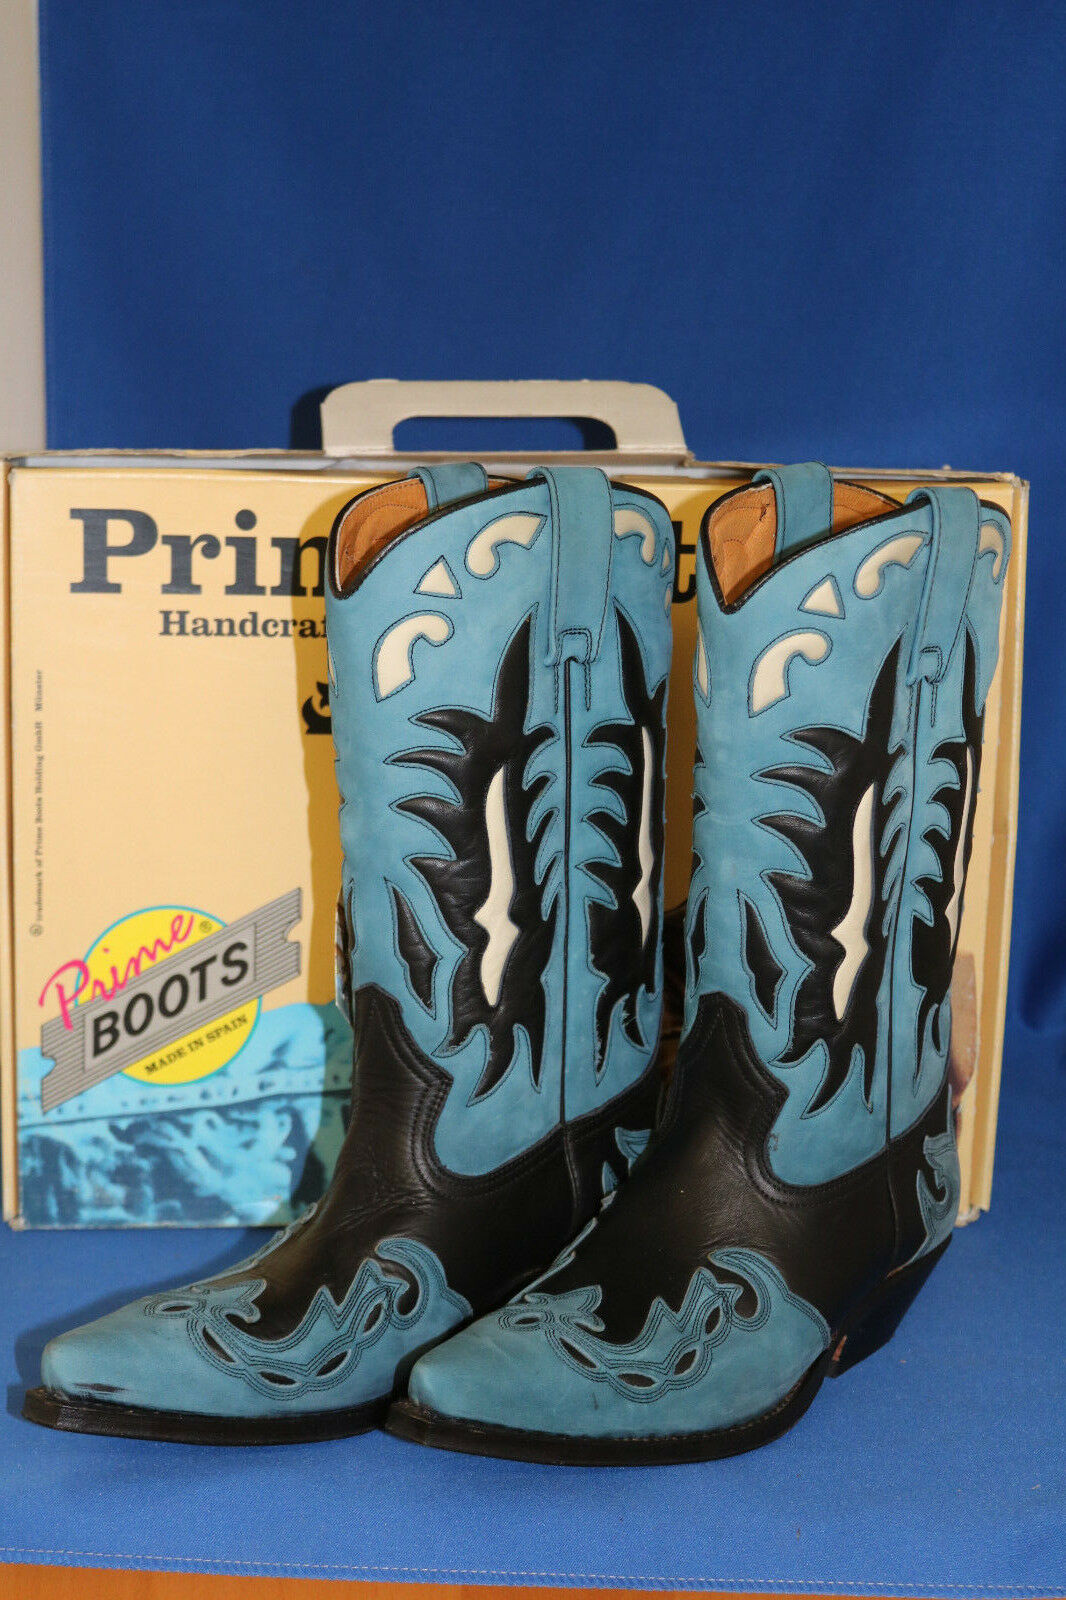 Prime Boots  design cowboystiefel westernstiefel neu handmade gr. 41 blue black